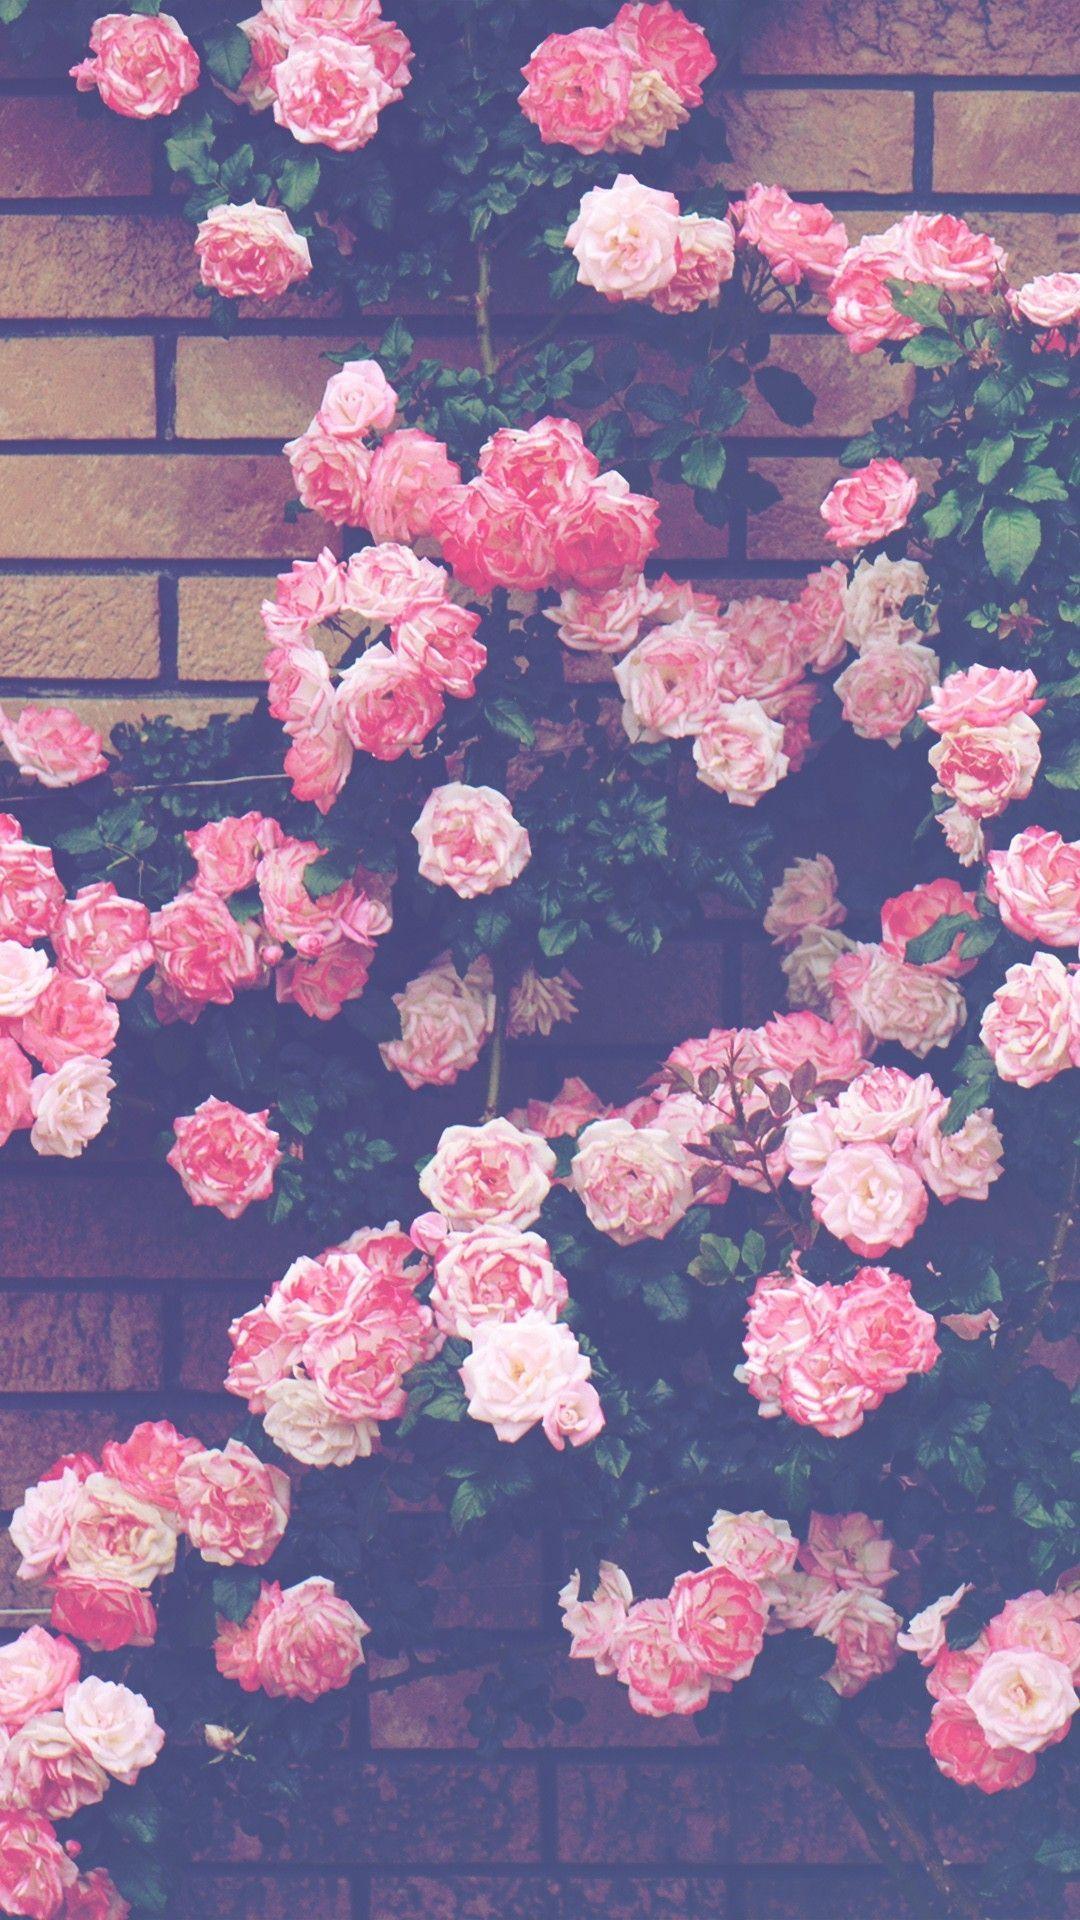 24 Pretty Photo Of Scrapbook Aesthetic Wallpaper Scrapbook Aesthetic Wallpaper Flowers Outside My Flower Iphone Wallpaper Flower Wallpaper Pretty Wallpapers